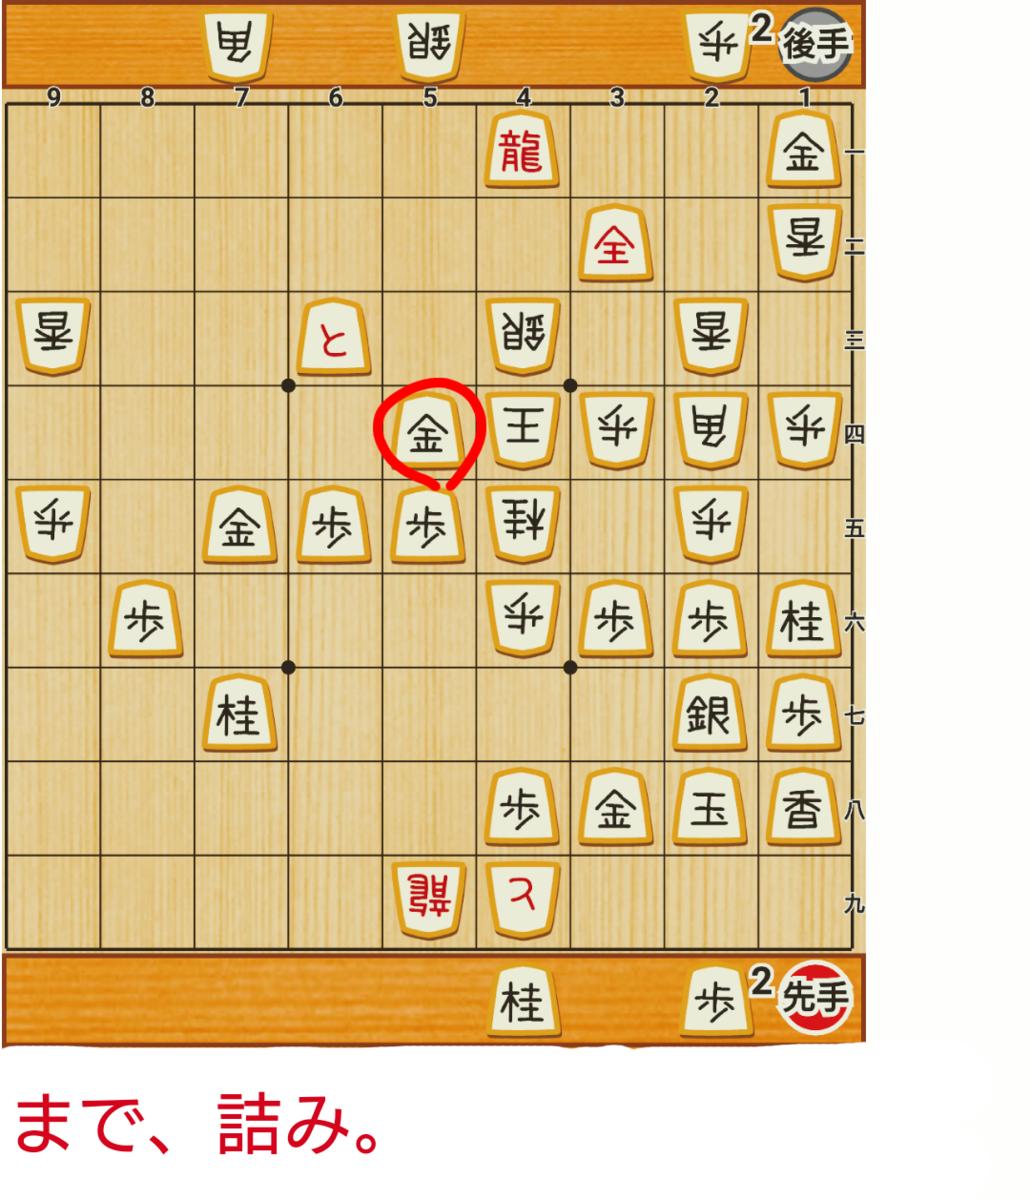 f:id:nao-shodan:20200920202741p:plain